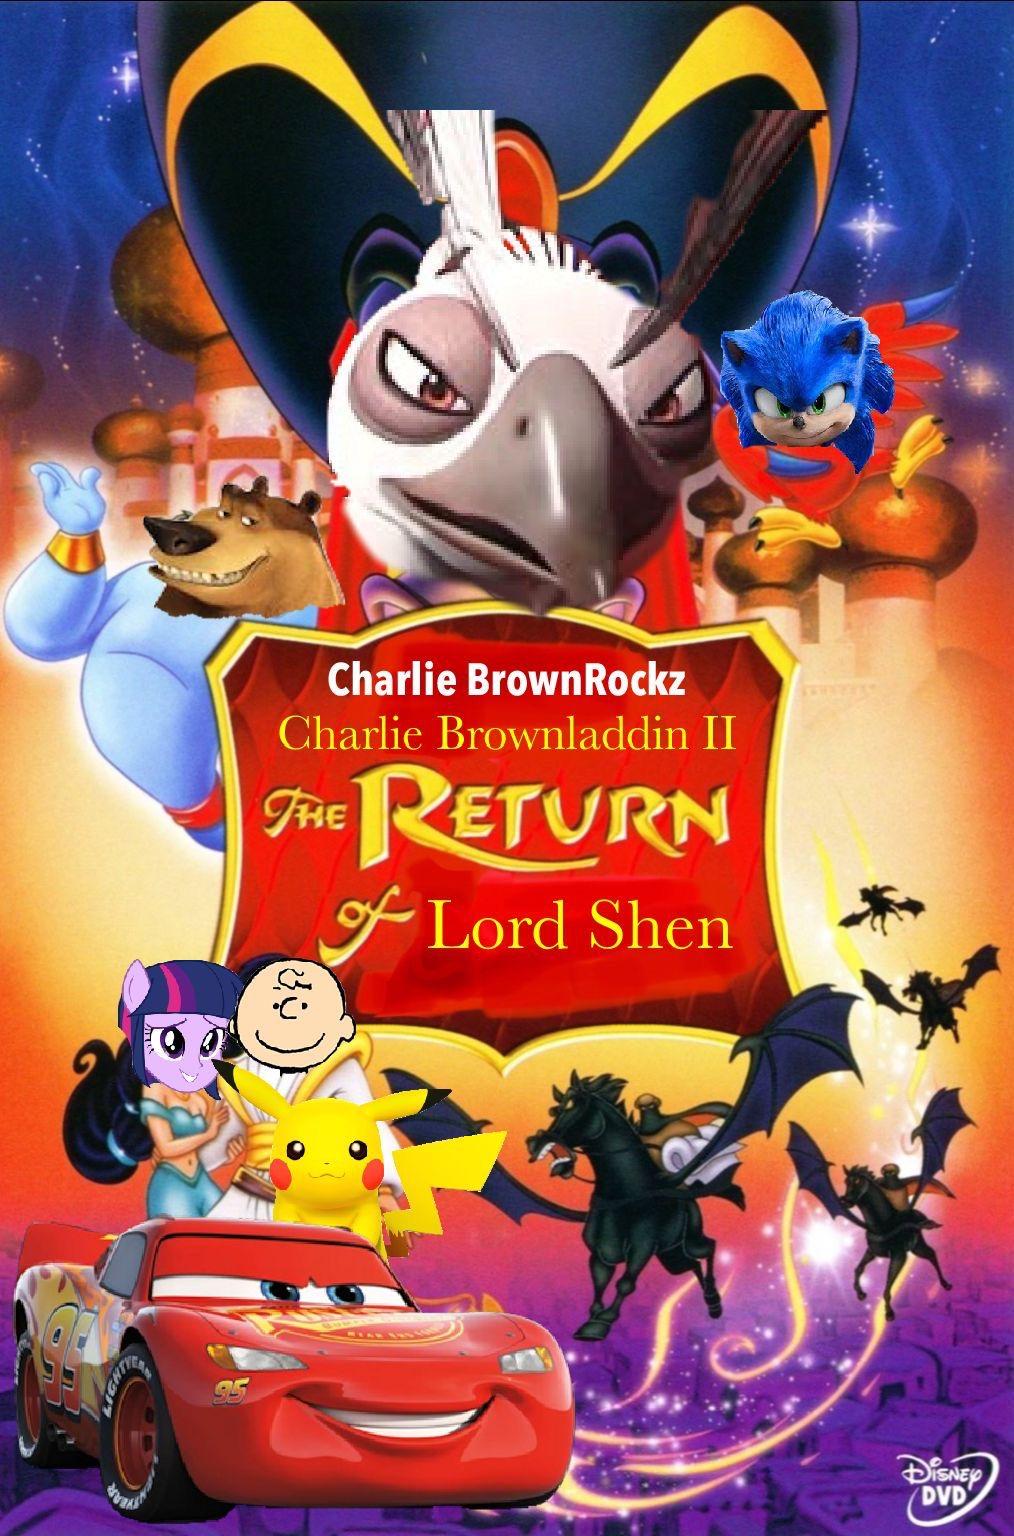 Charlie Brownladdin II: The Return of Lord Shen